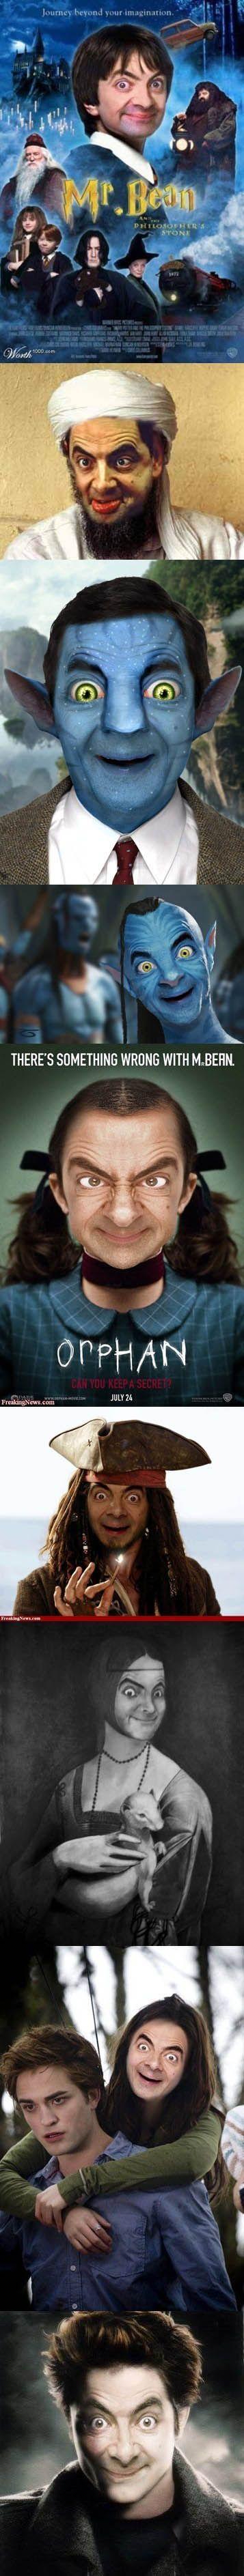 Just Mr. Bean.